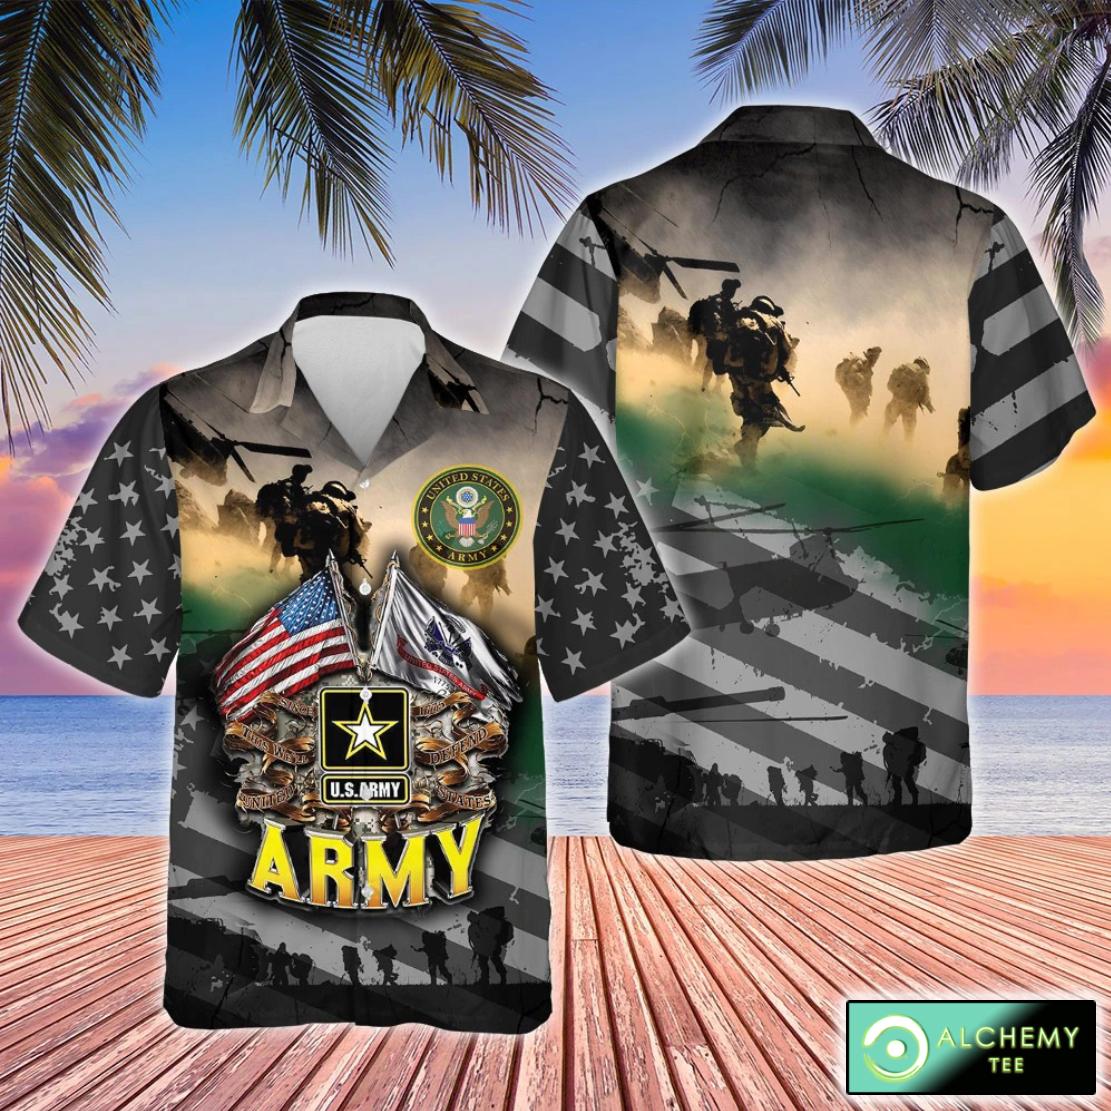 Proudly served U.S Army short sleeve hawaiian shirt